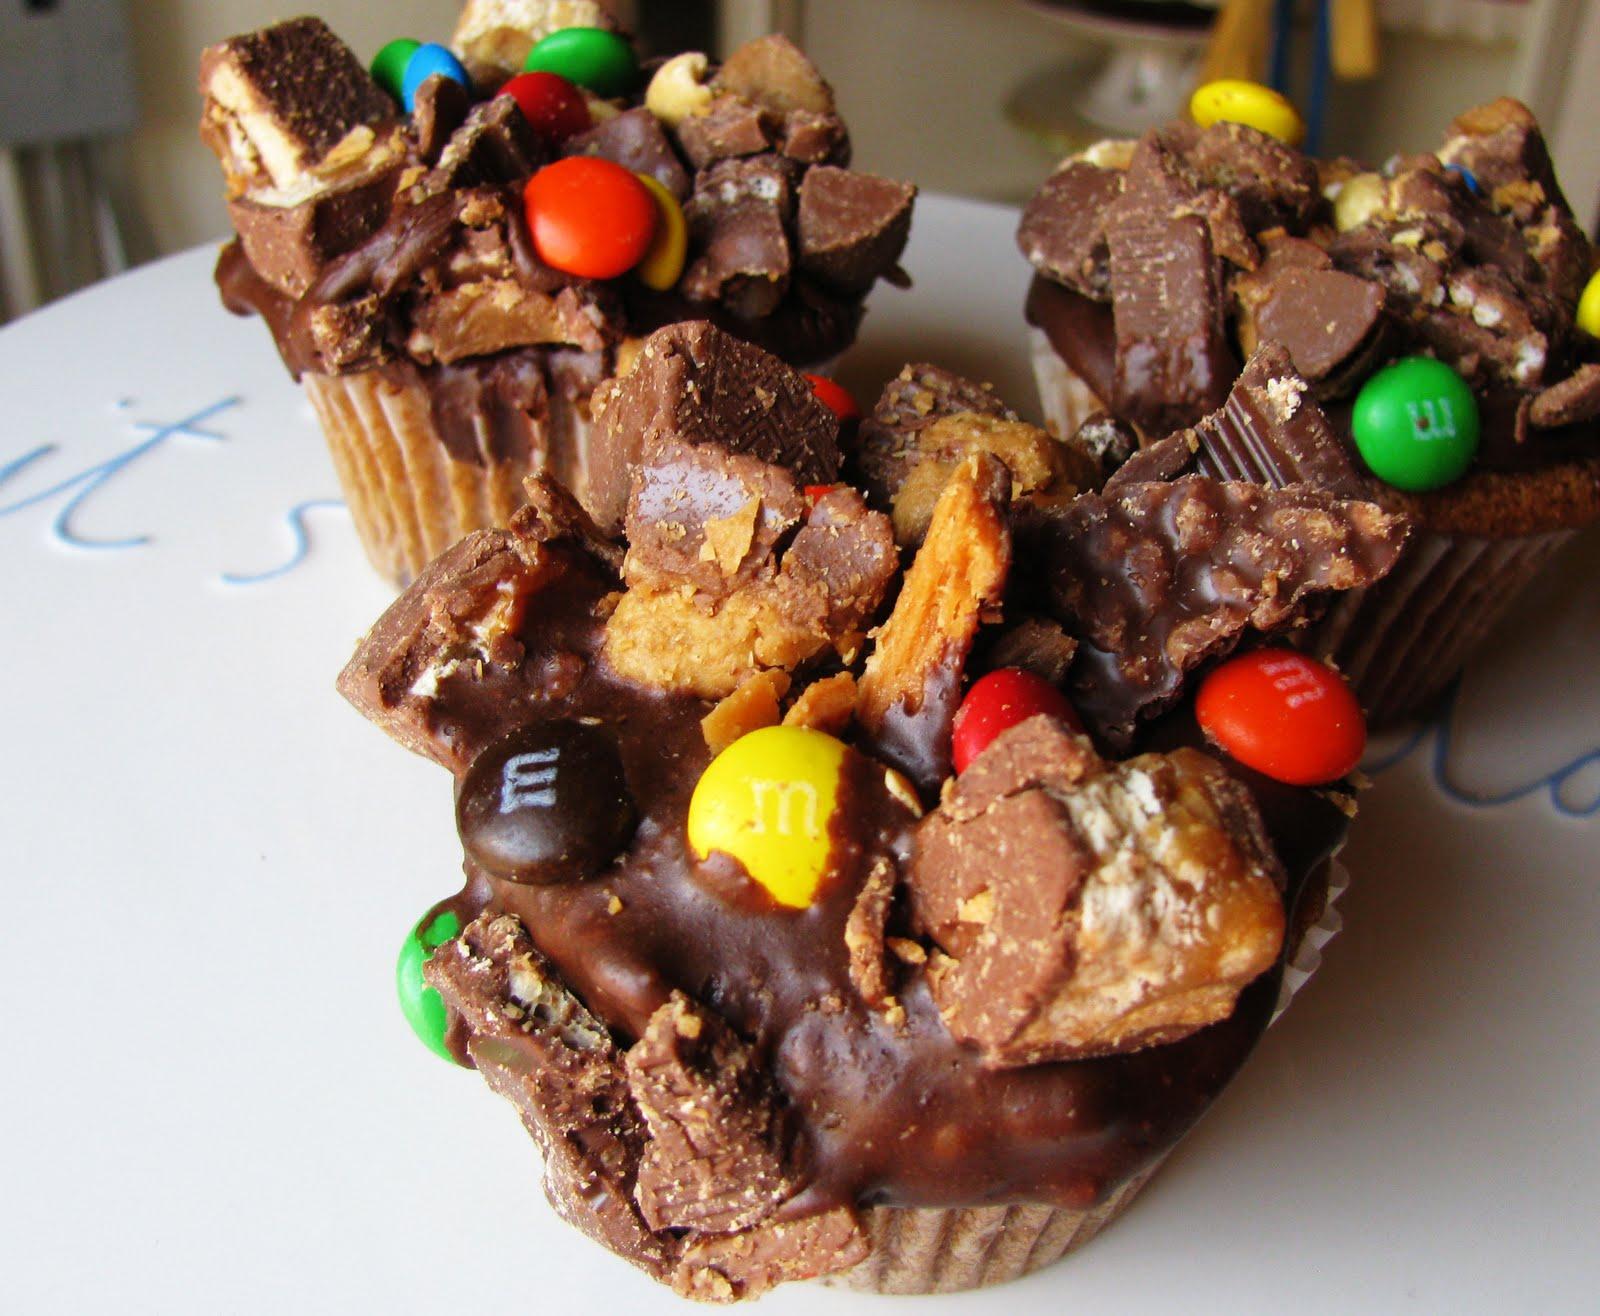 Chocolate Candy Bar Cupcake